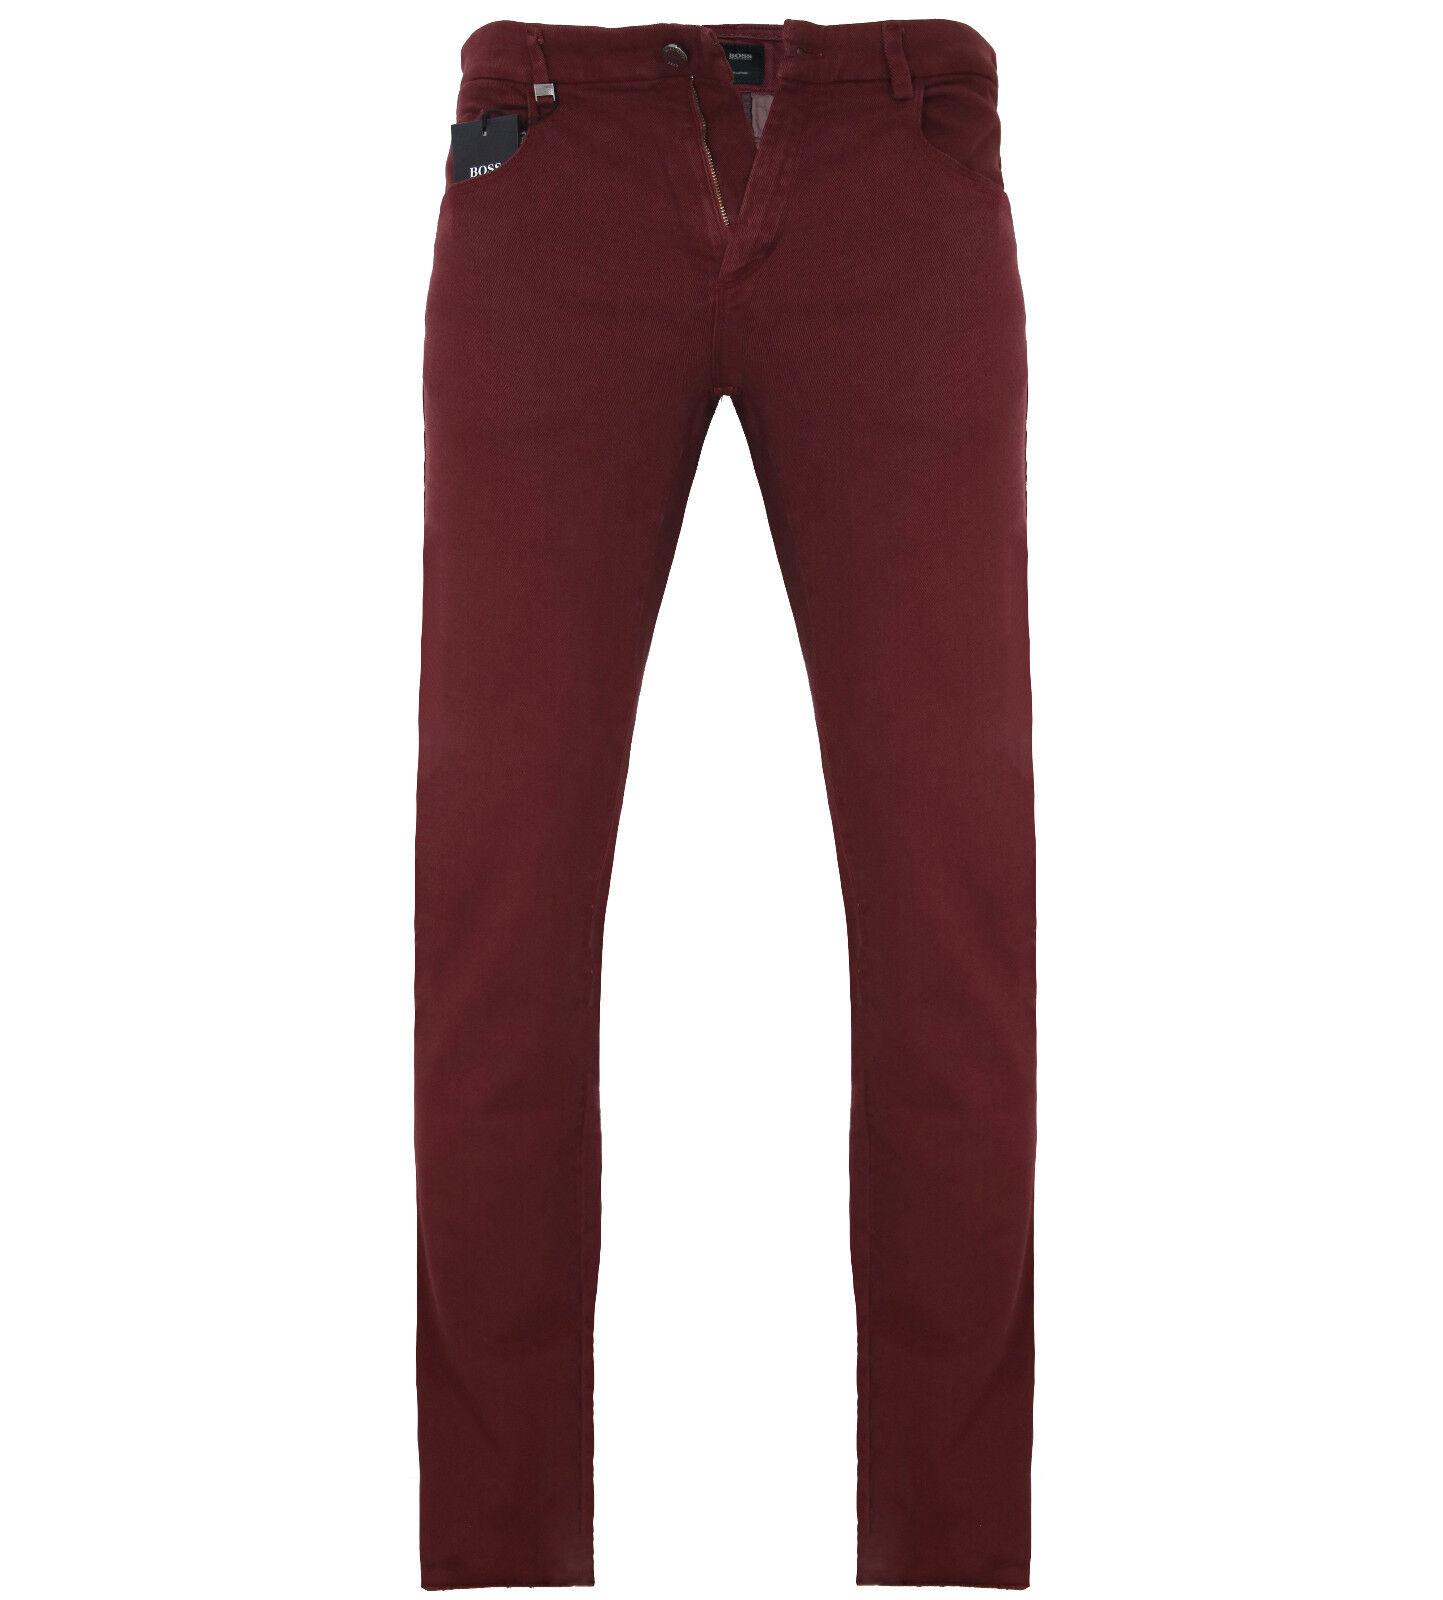 HUGO BOSS TAILORED Hose Jeans  T-Lincoln1  W33 L34  NEU  SLIM FIT STRETCH